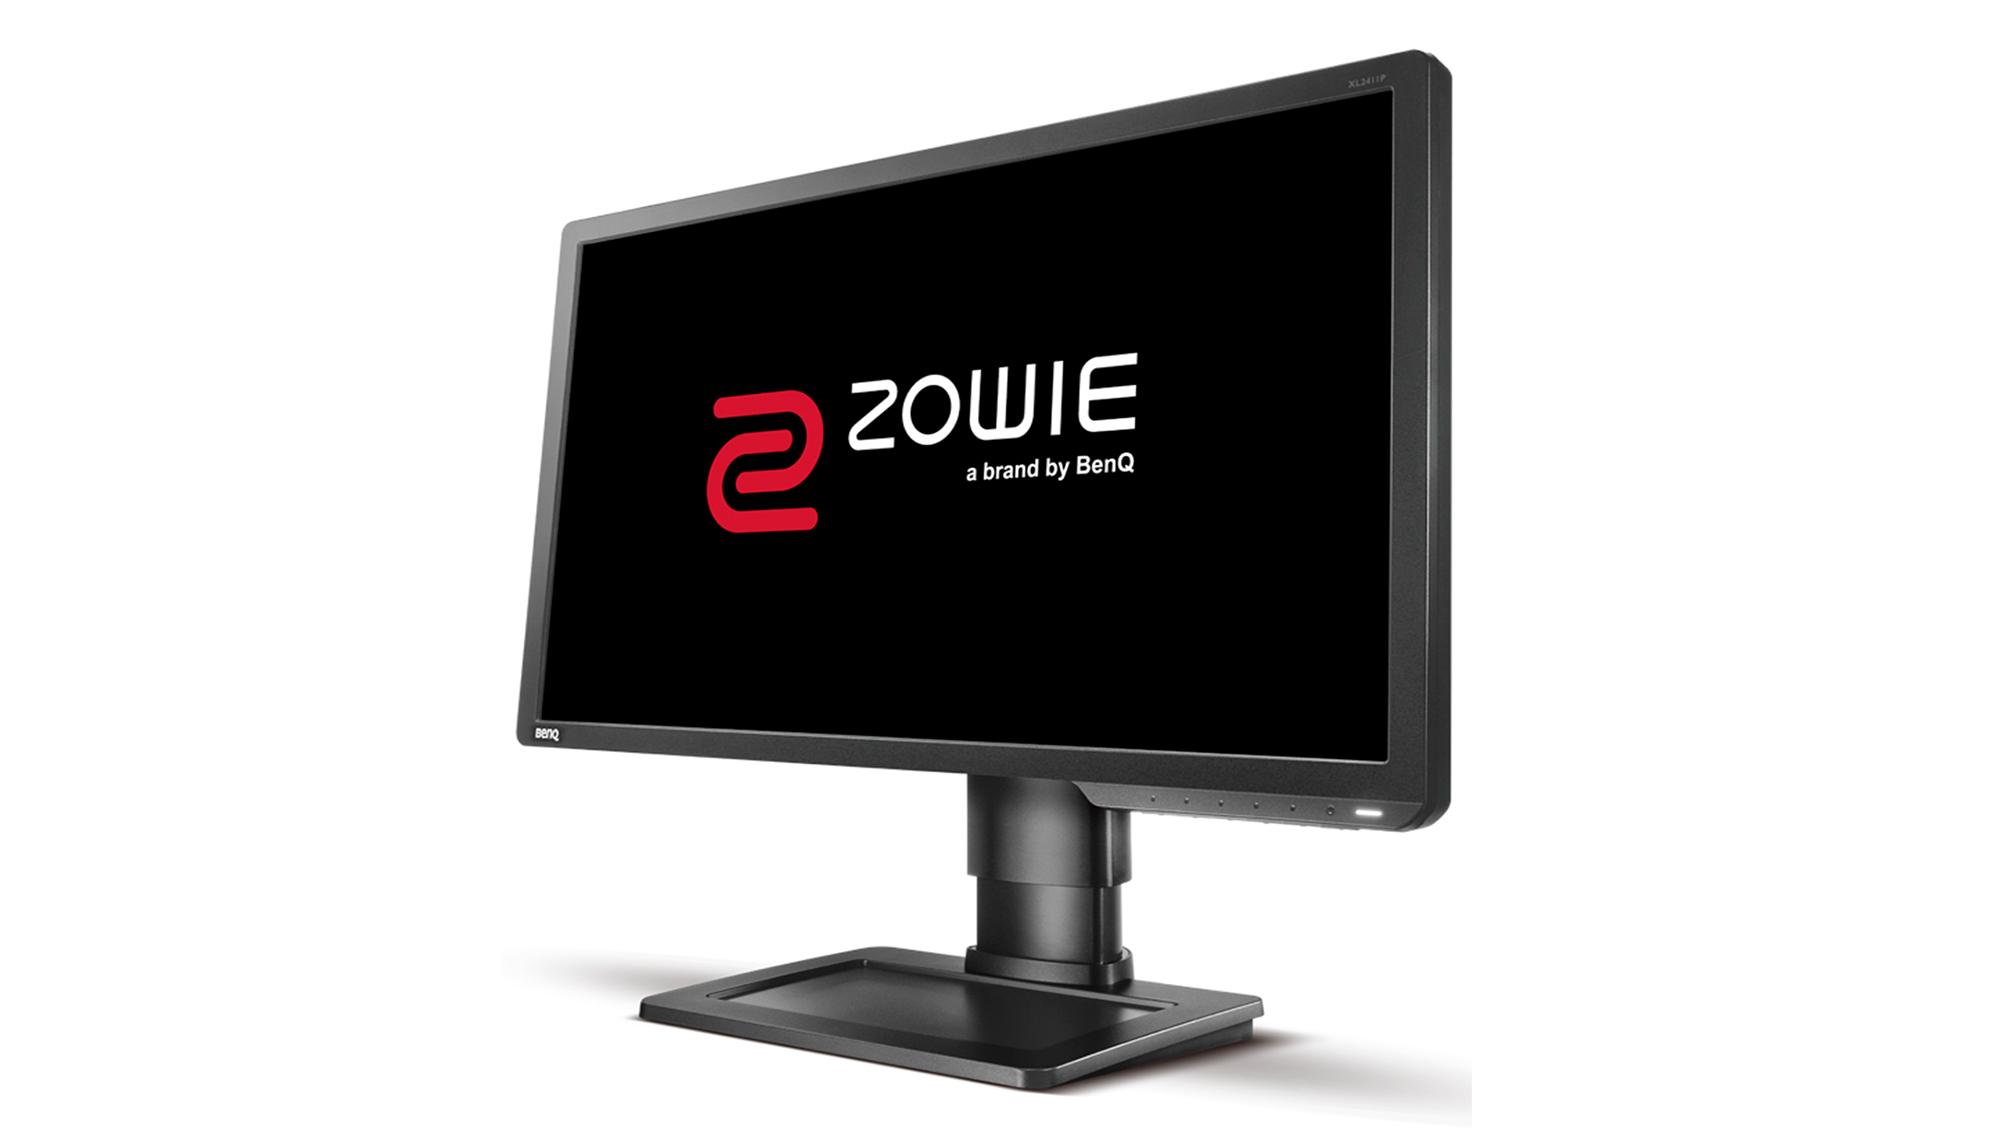 "BenQ ZOWIE XL2411P - Monitor Gaming de 24"" Full HD (1920 x 1080, 1 ms, 144 Hz, HDMI, Black eQualizer, Color Vibrance, DisplayPort, DVI-DL, Flicker-free, Altura Ajustable) - Gris Oscuro"